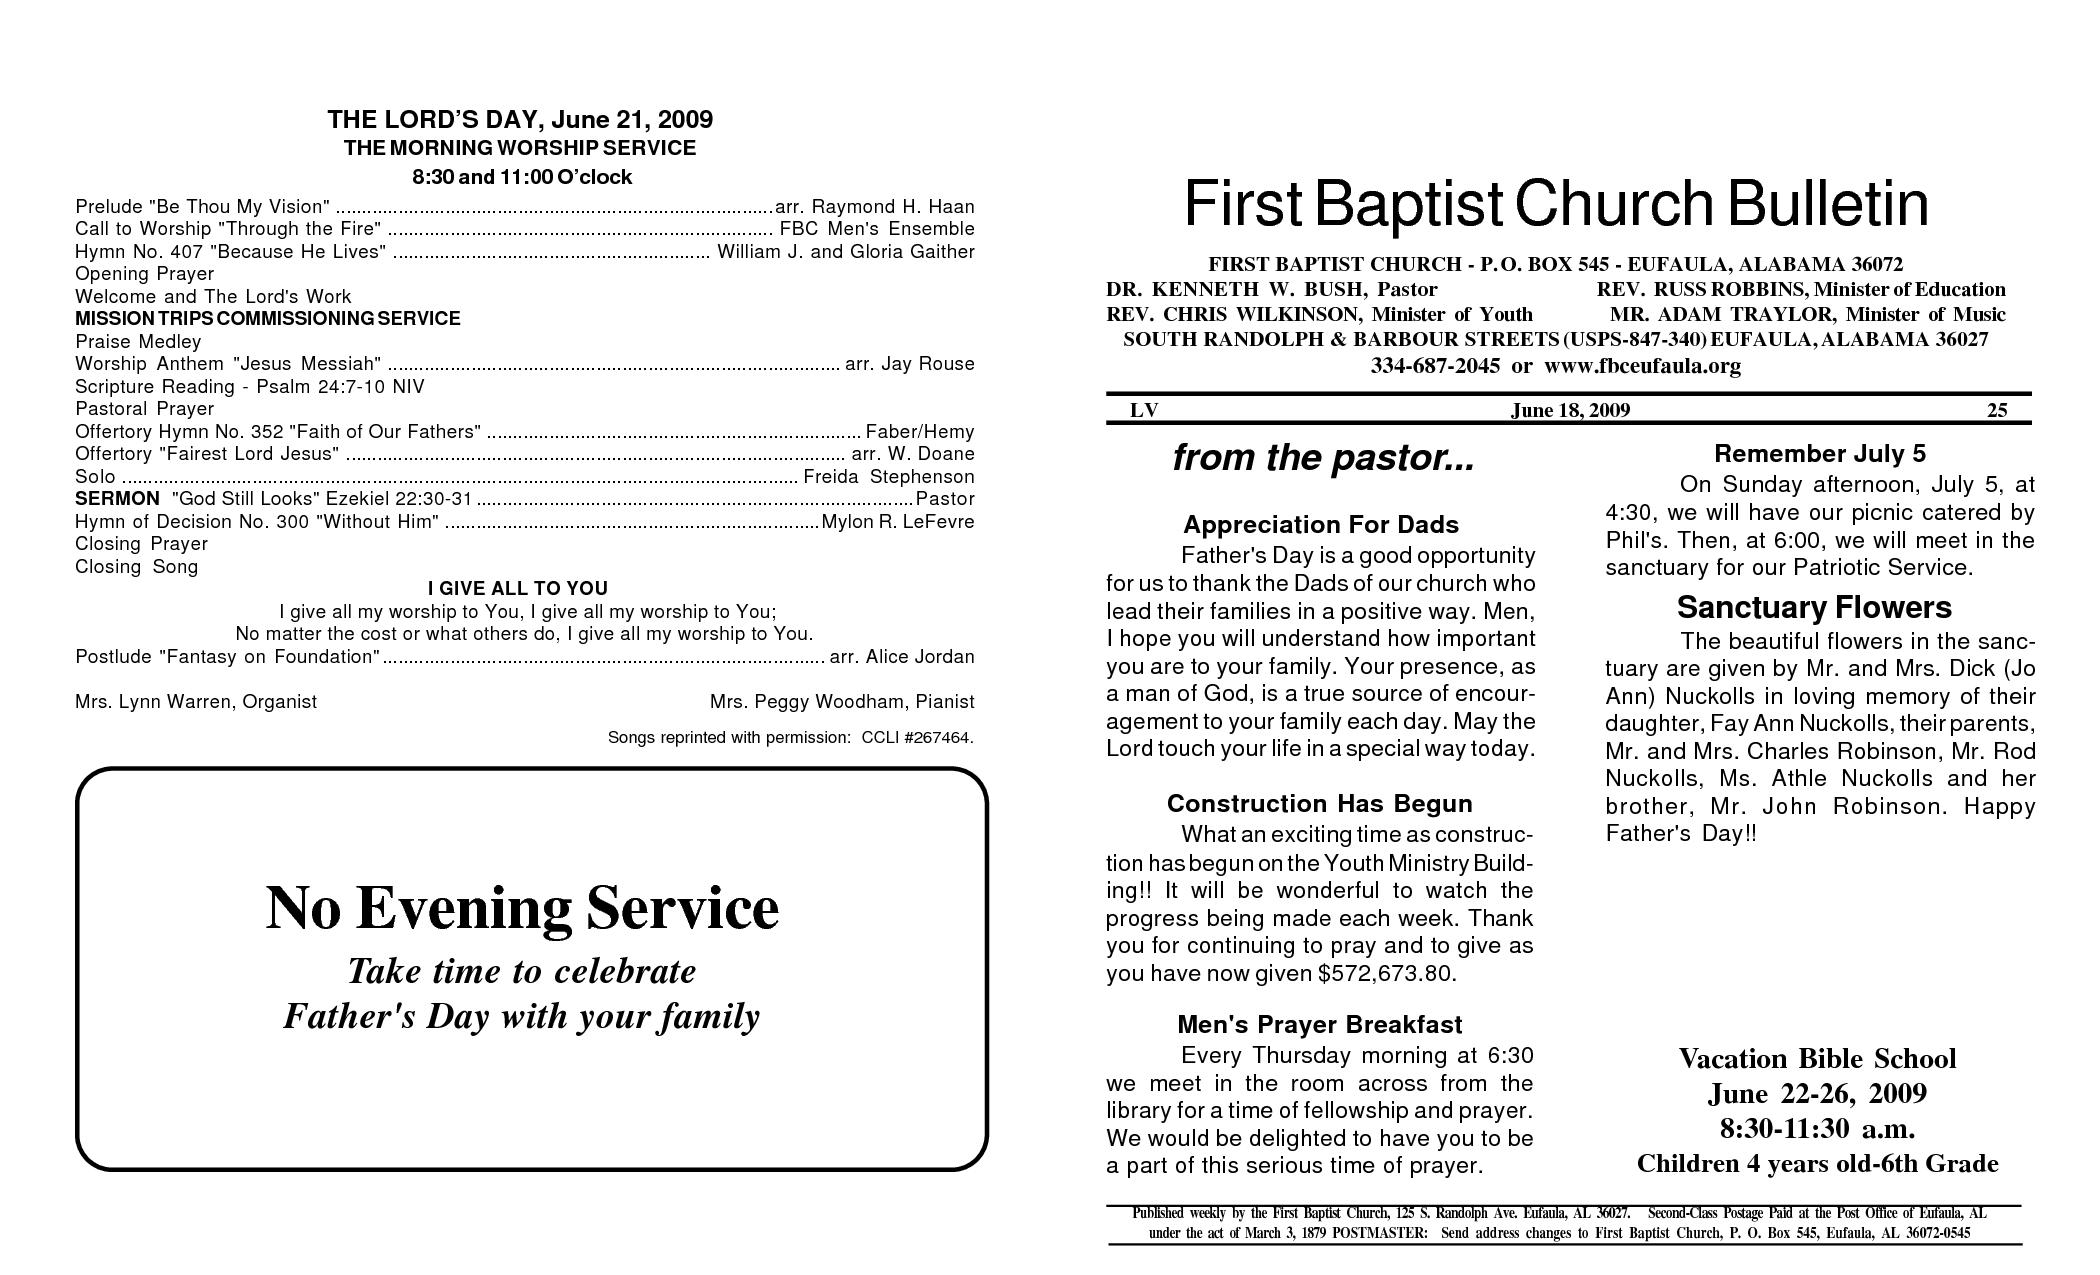 Memorial Service Programs Sample | First Baptist Church Bulletin No Evening  Service